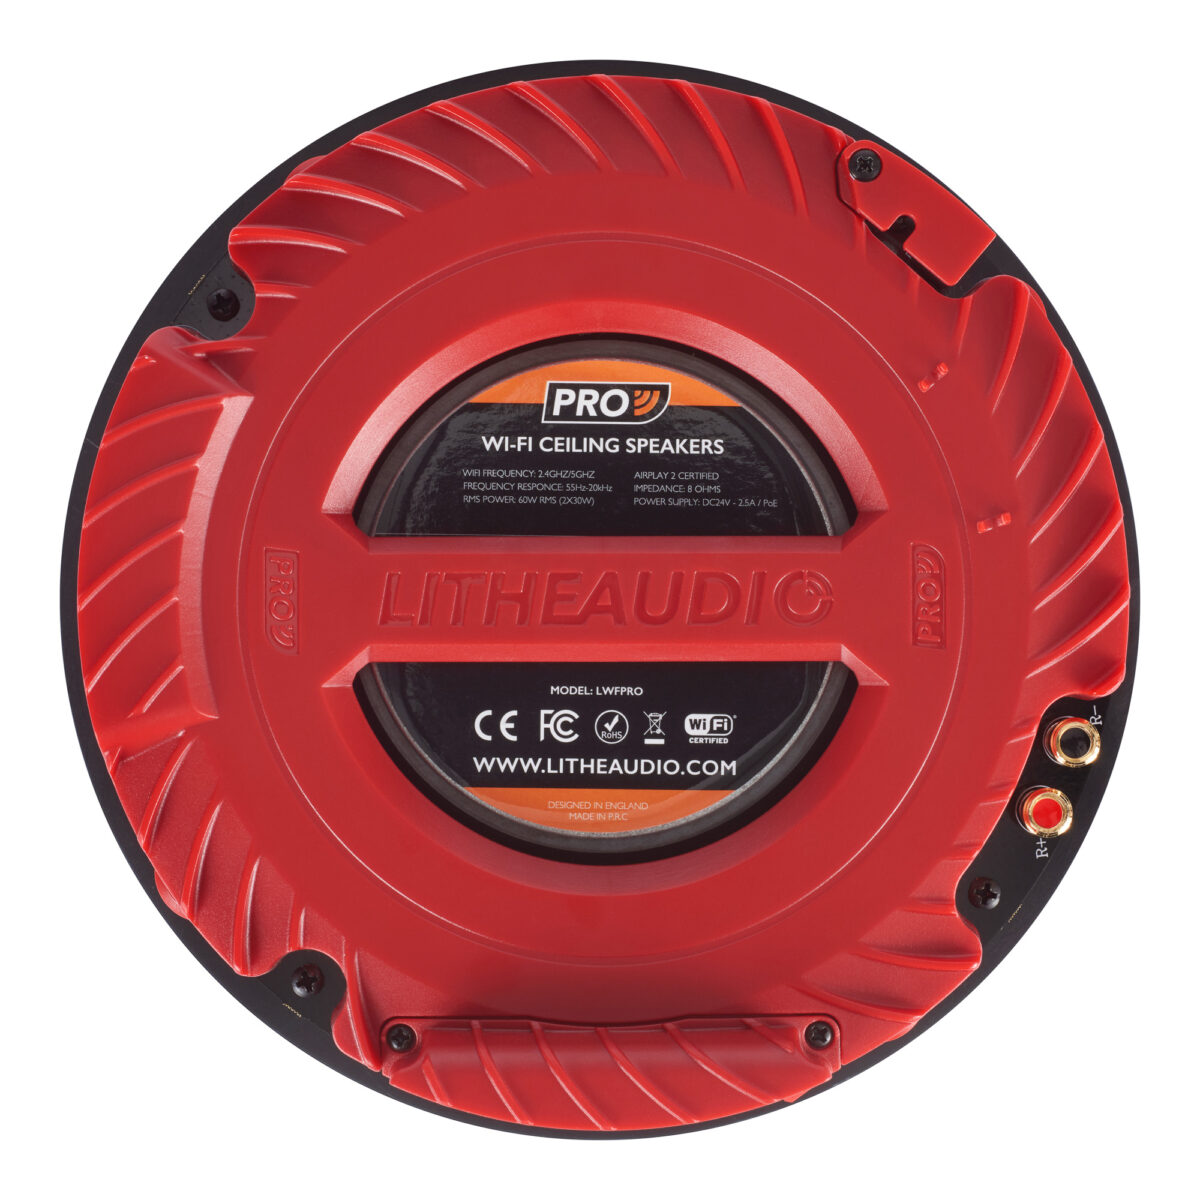 Lithe Audio Pro Series Ip44 Bathroom Wi Fi Ceiling Speaker (single) 1 Life Style Store